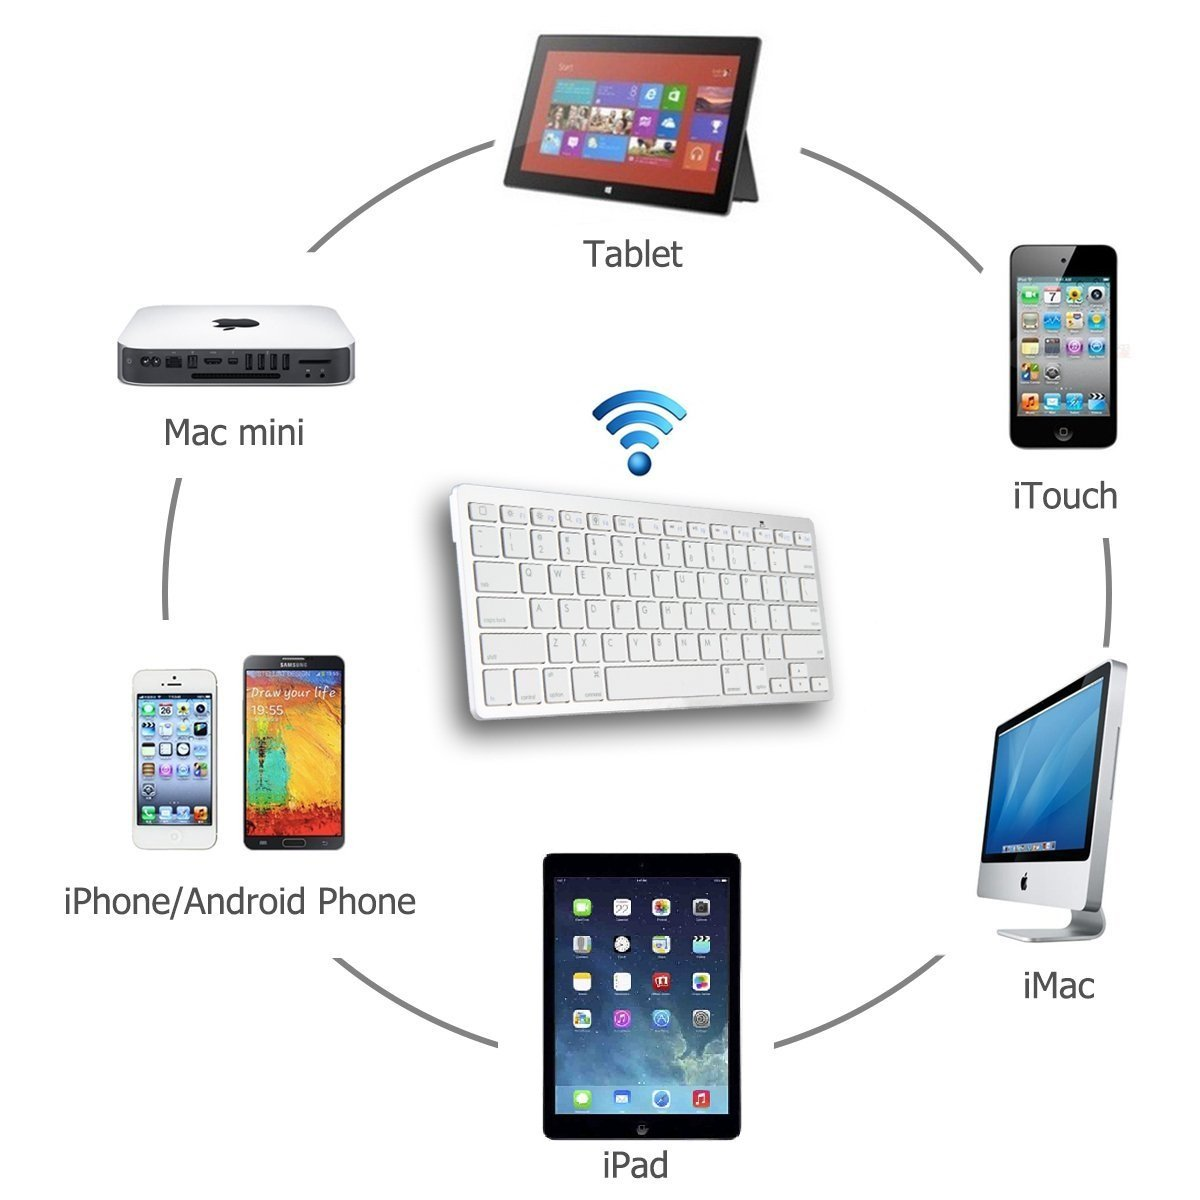 SPARIN iPad Bluetooth Wireless Keyboard for iPad Pro 12.9/ 10.5/ 9.7, New iPad 9.7, iPad Air/ Air 2, iPad Mini 4/ 3/ 2/ 1, iPhone 8/ 8 Plus/ 7 Plus/ 7/ 6s Plus /6s, etc, for Apple, White